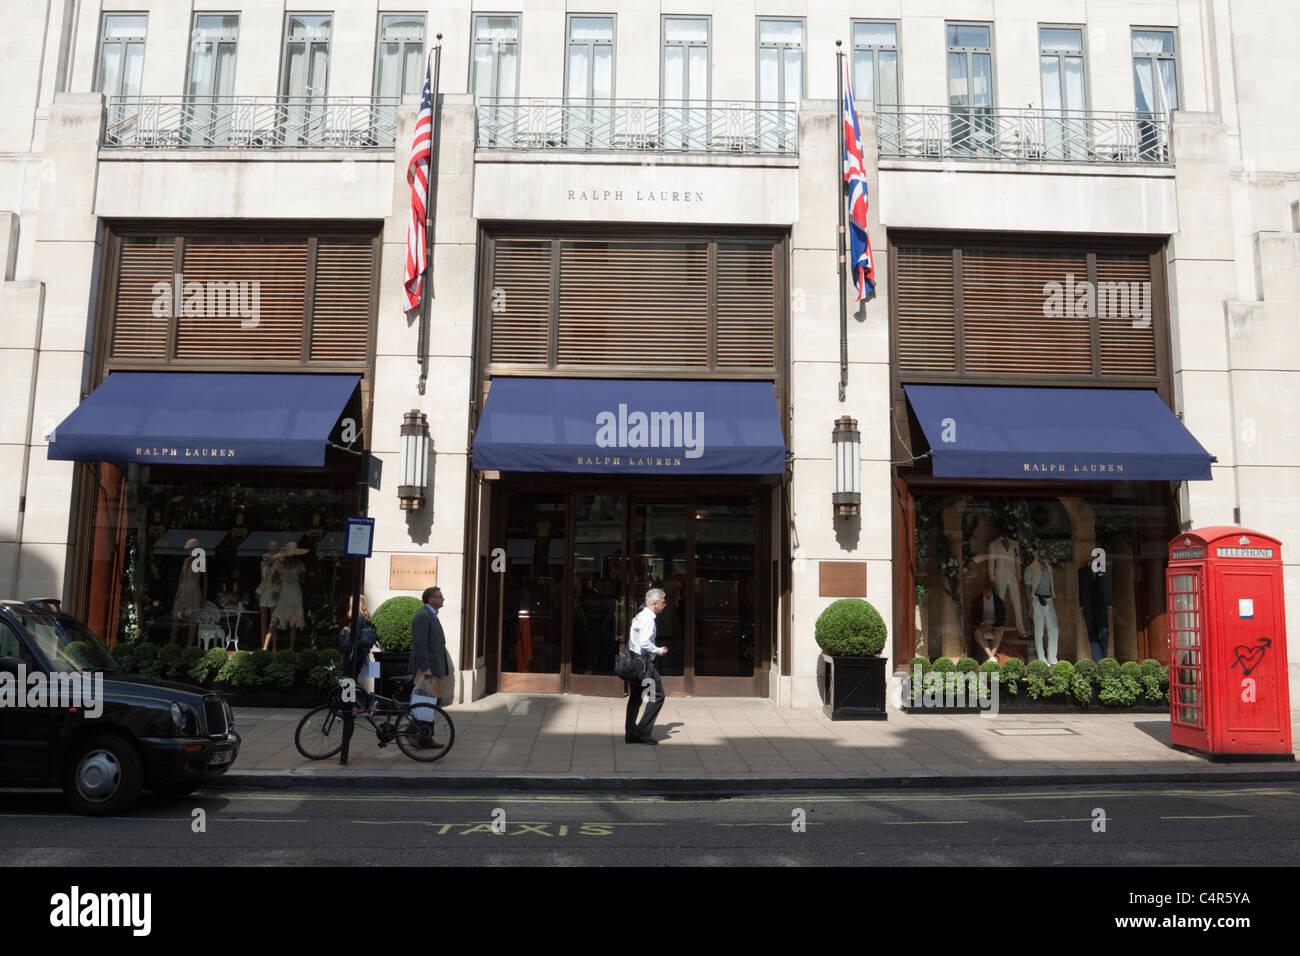 Ralph Lauren boutique store front, New Bond Street, Londres, Angleterre 8b441f3dd21